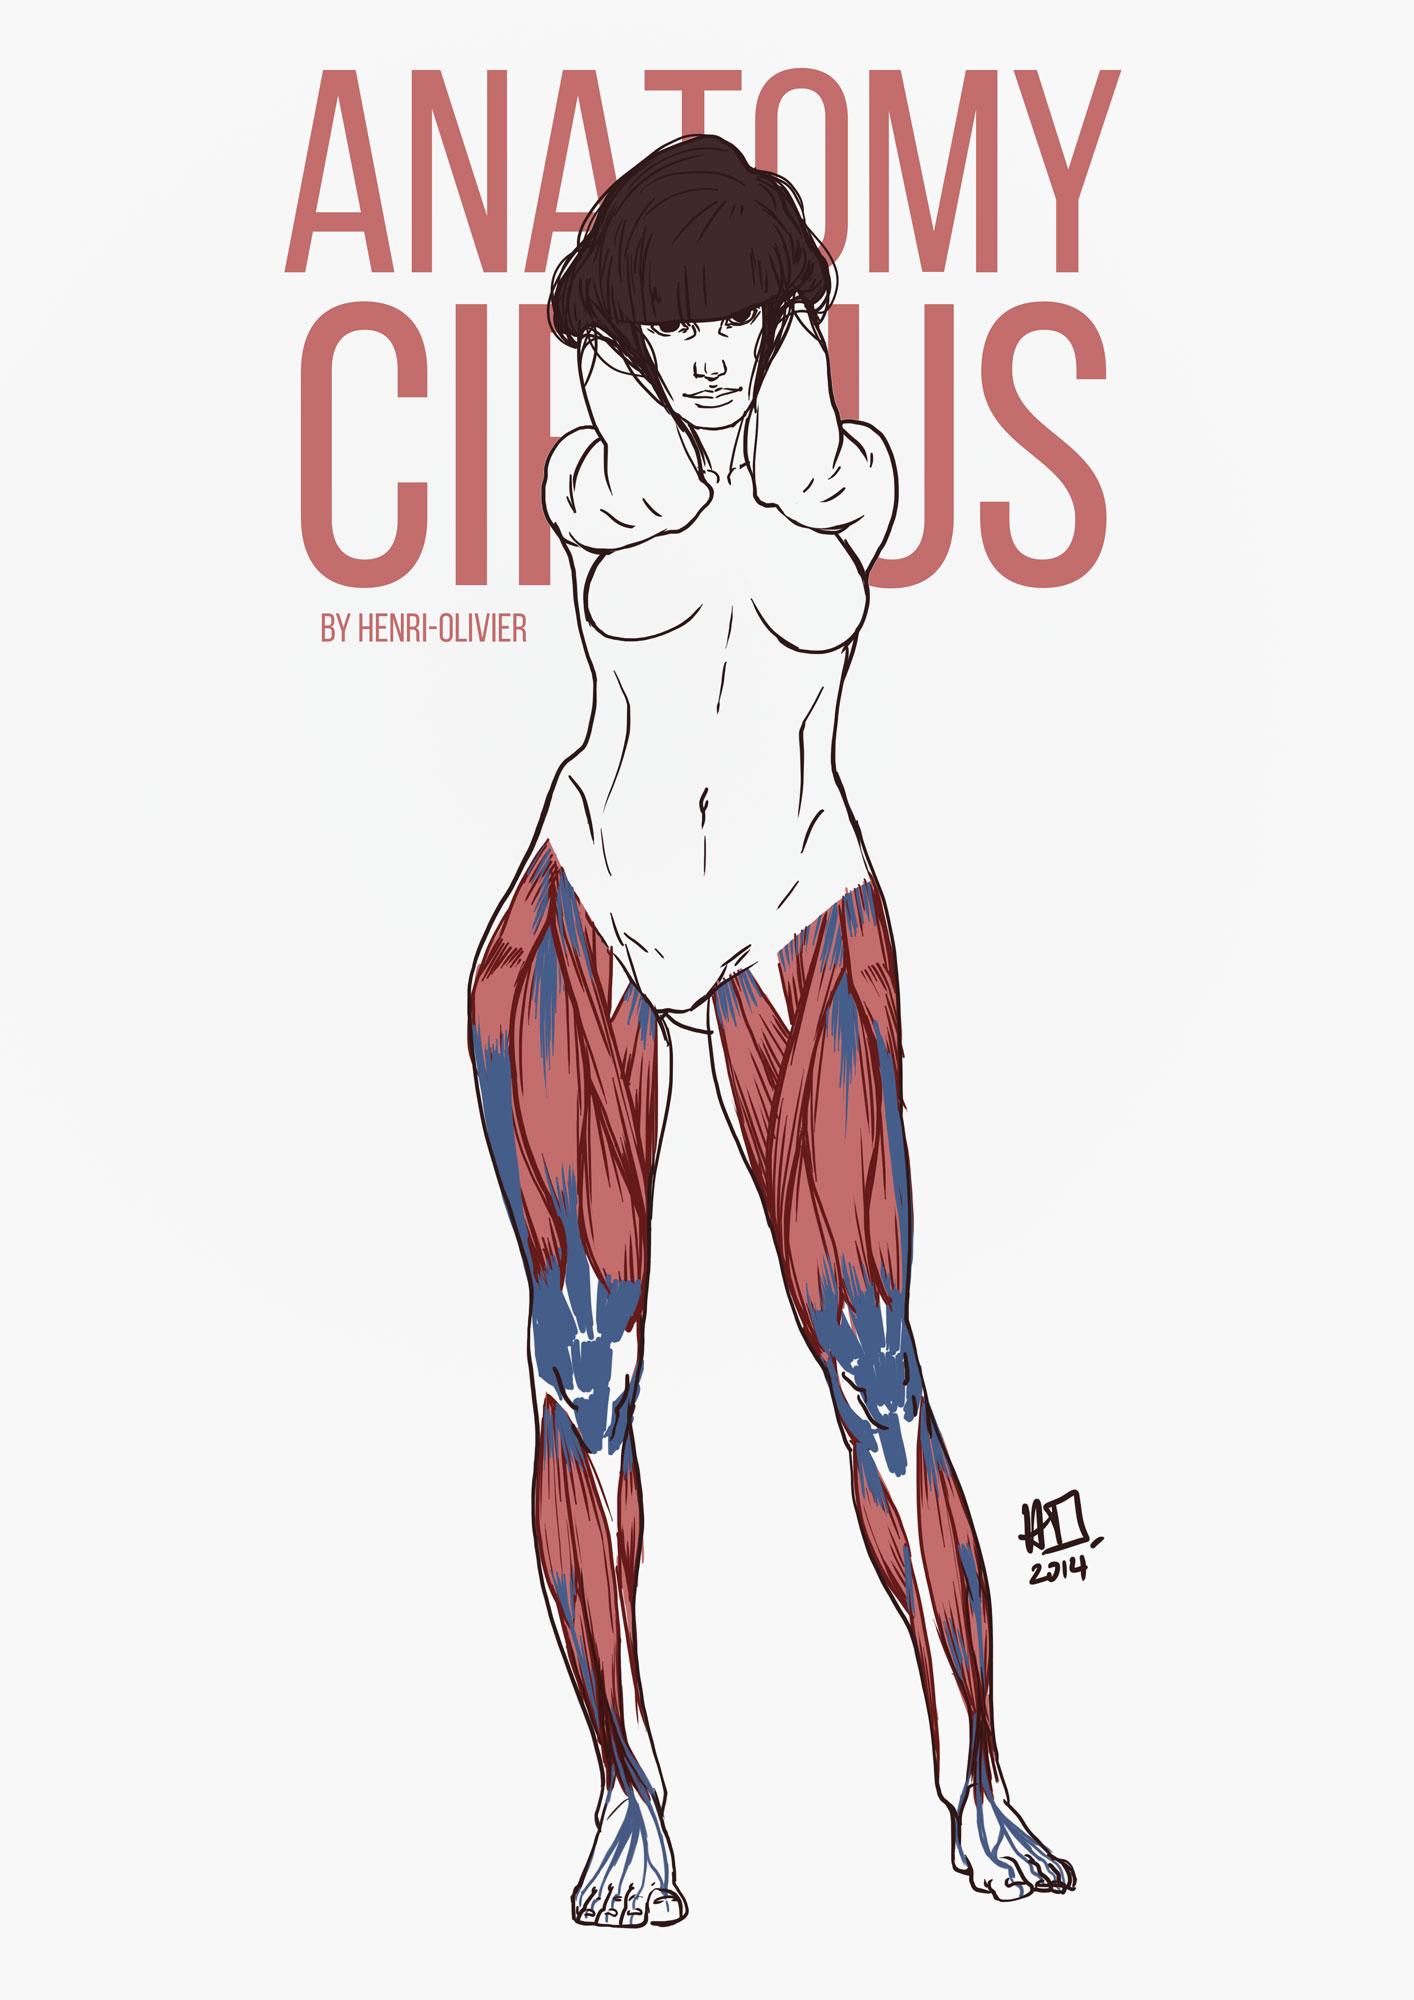 AnatomyCircus_Henri-Olivier_11